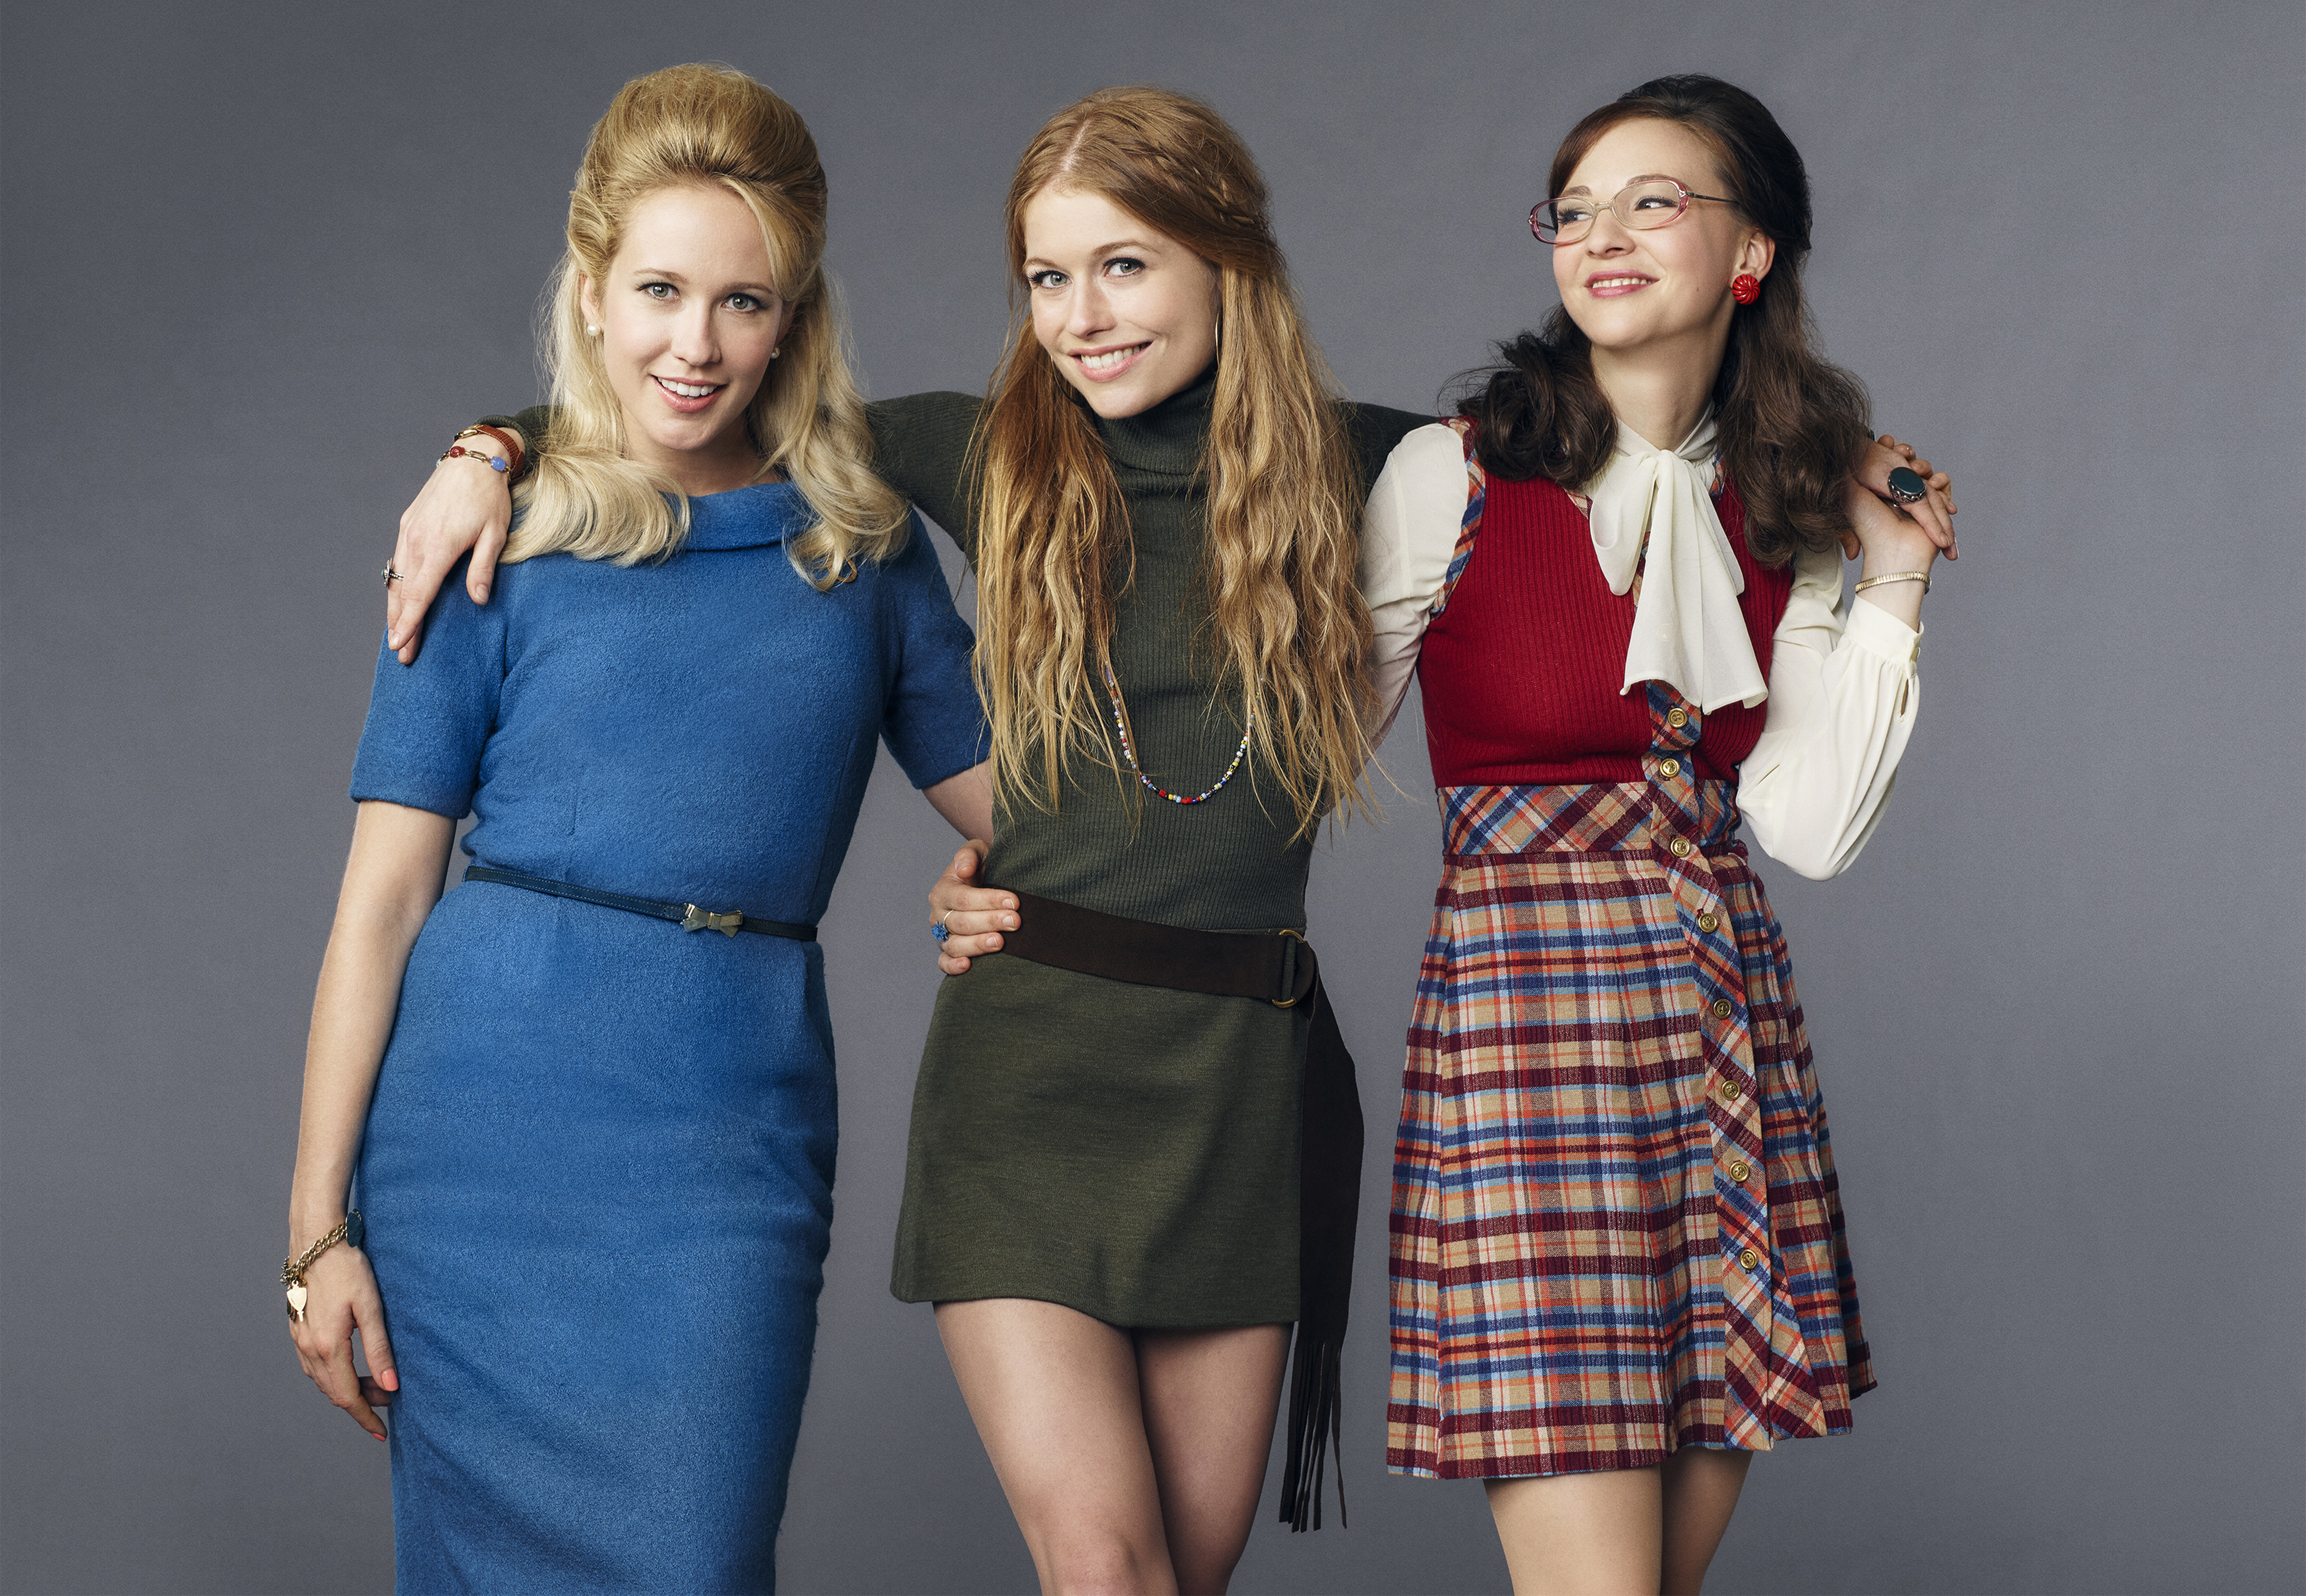 Amazon's Good Girls Revolt, from left: Anna Camp, Genevieve Angelson and Erin Darke